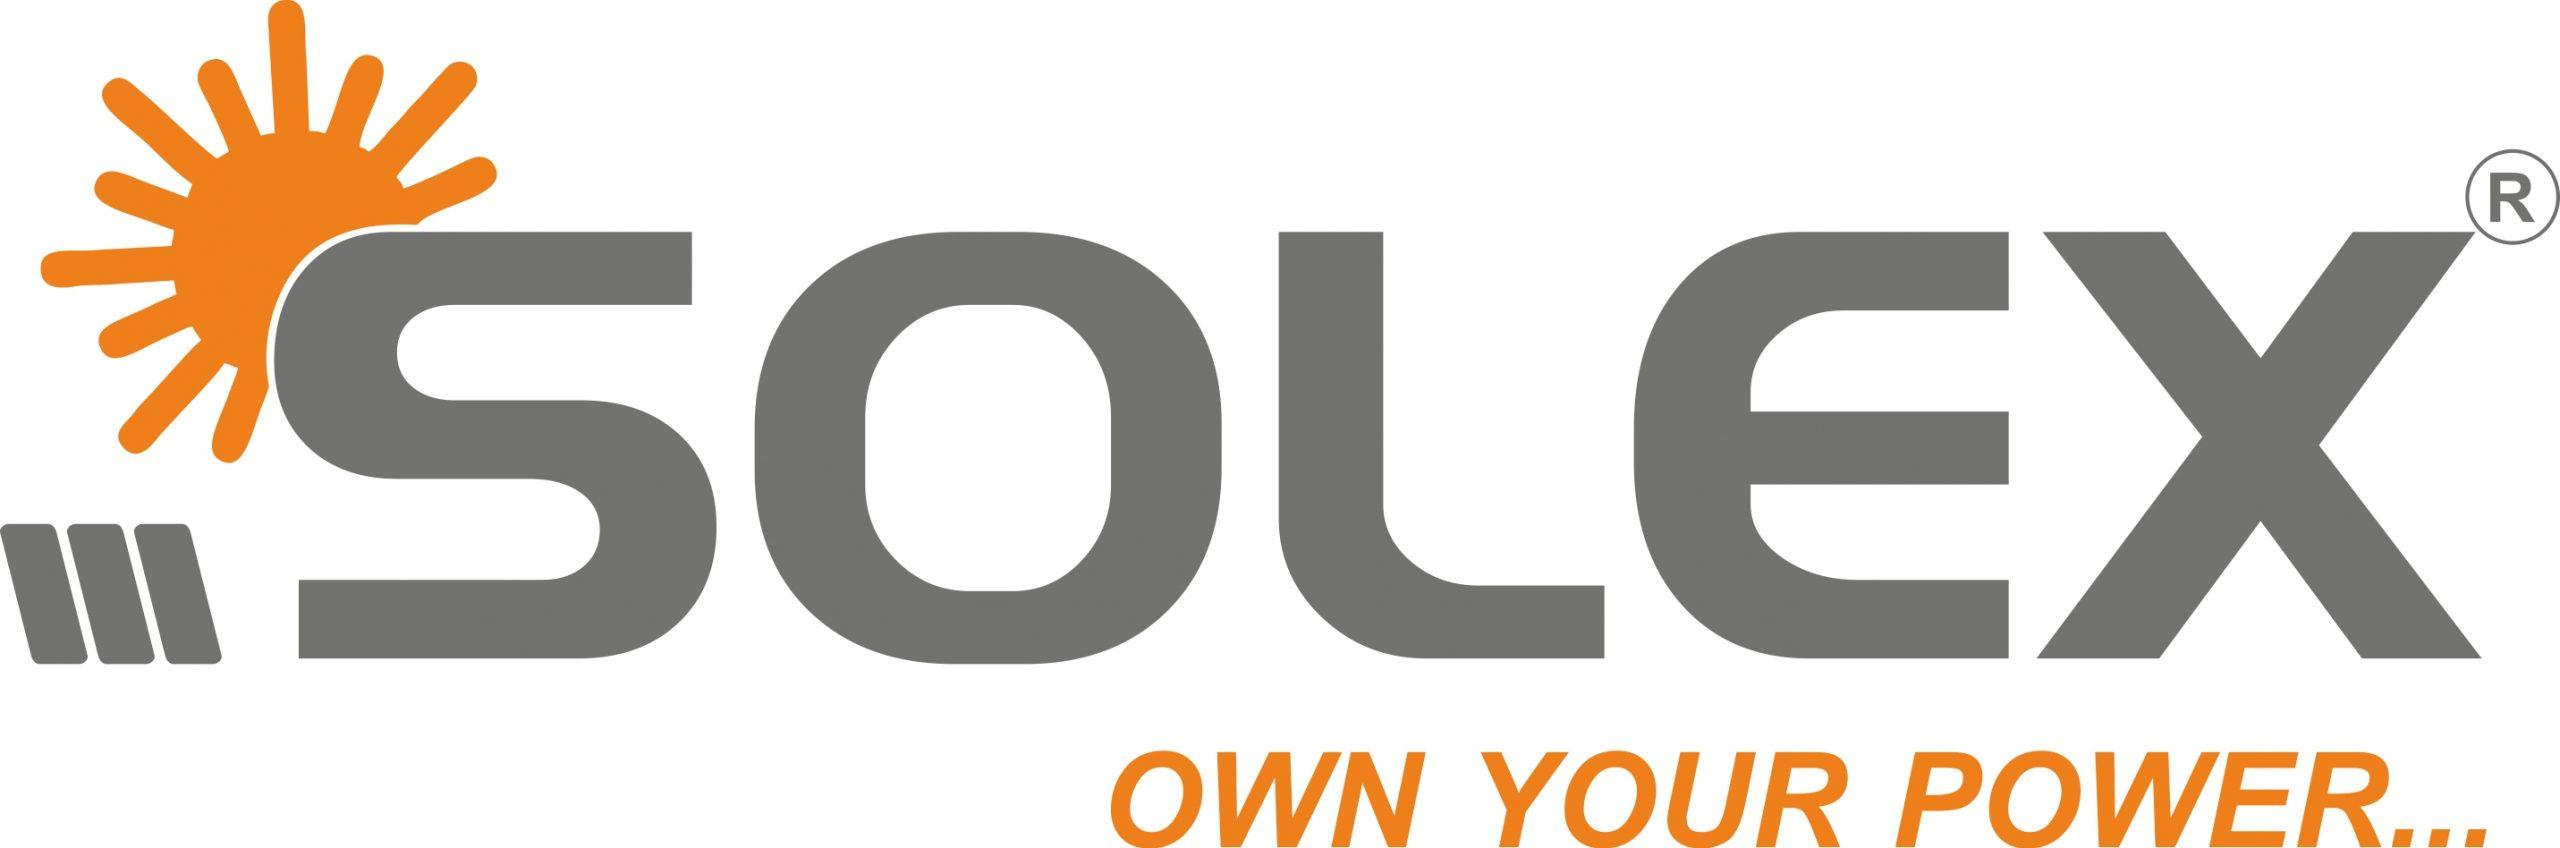 Solex Energy Ltd is the 2nd most trustworthy Solar EPC Company